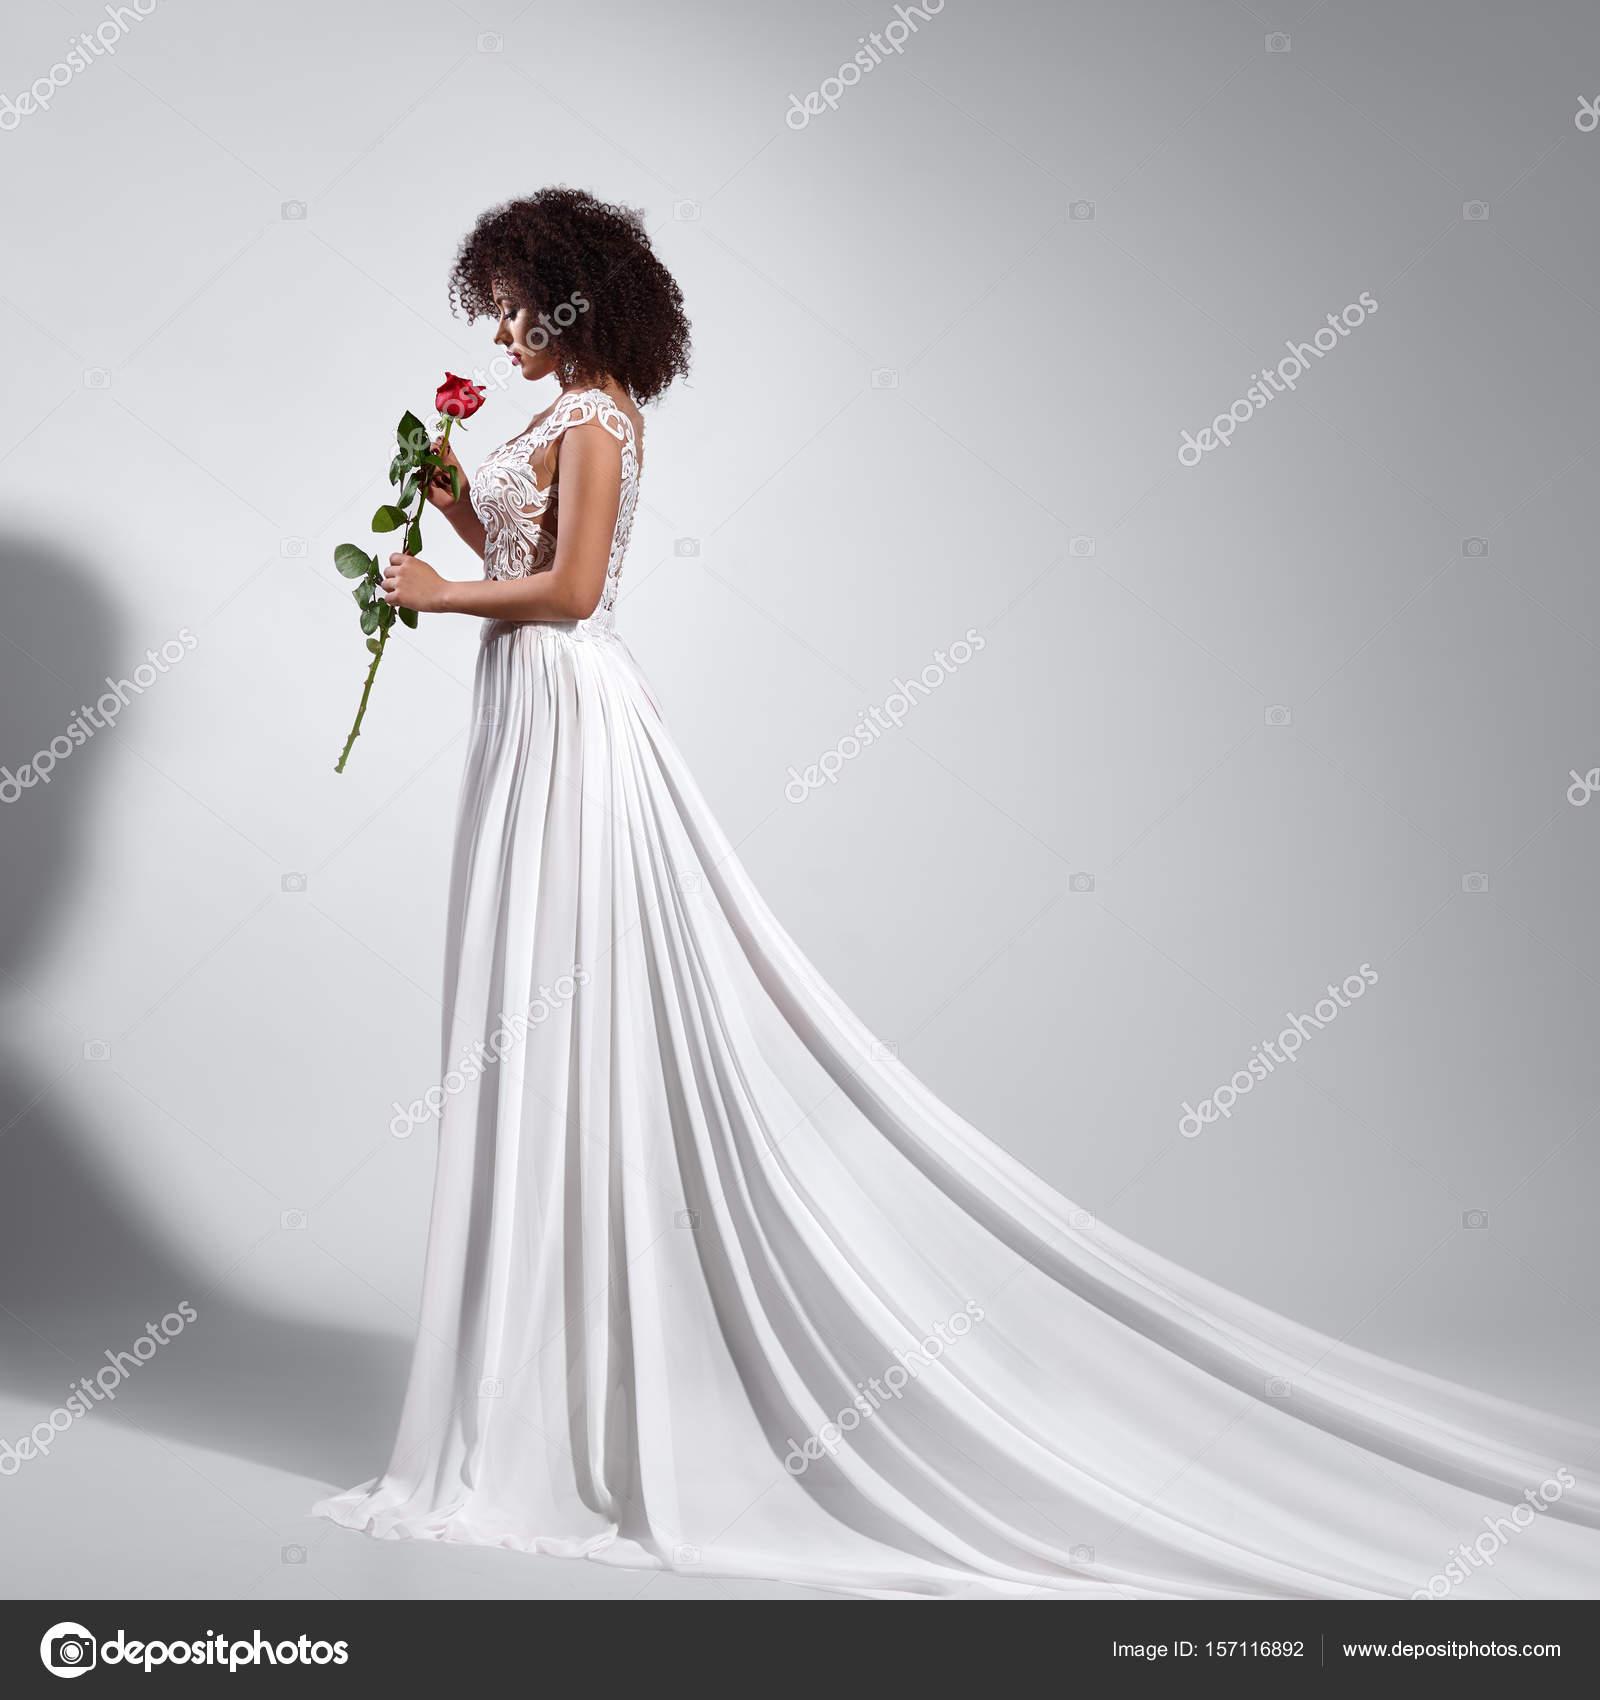 Bruiloft Jurk Meisje.Meisje Bruiloft Jurk Bruid Mooie Stockfoto C Fantasystudio